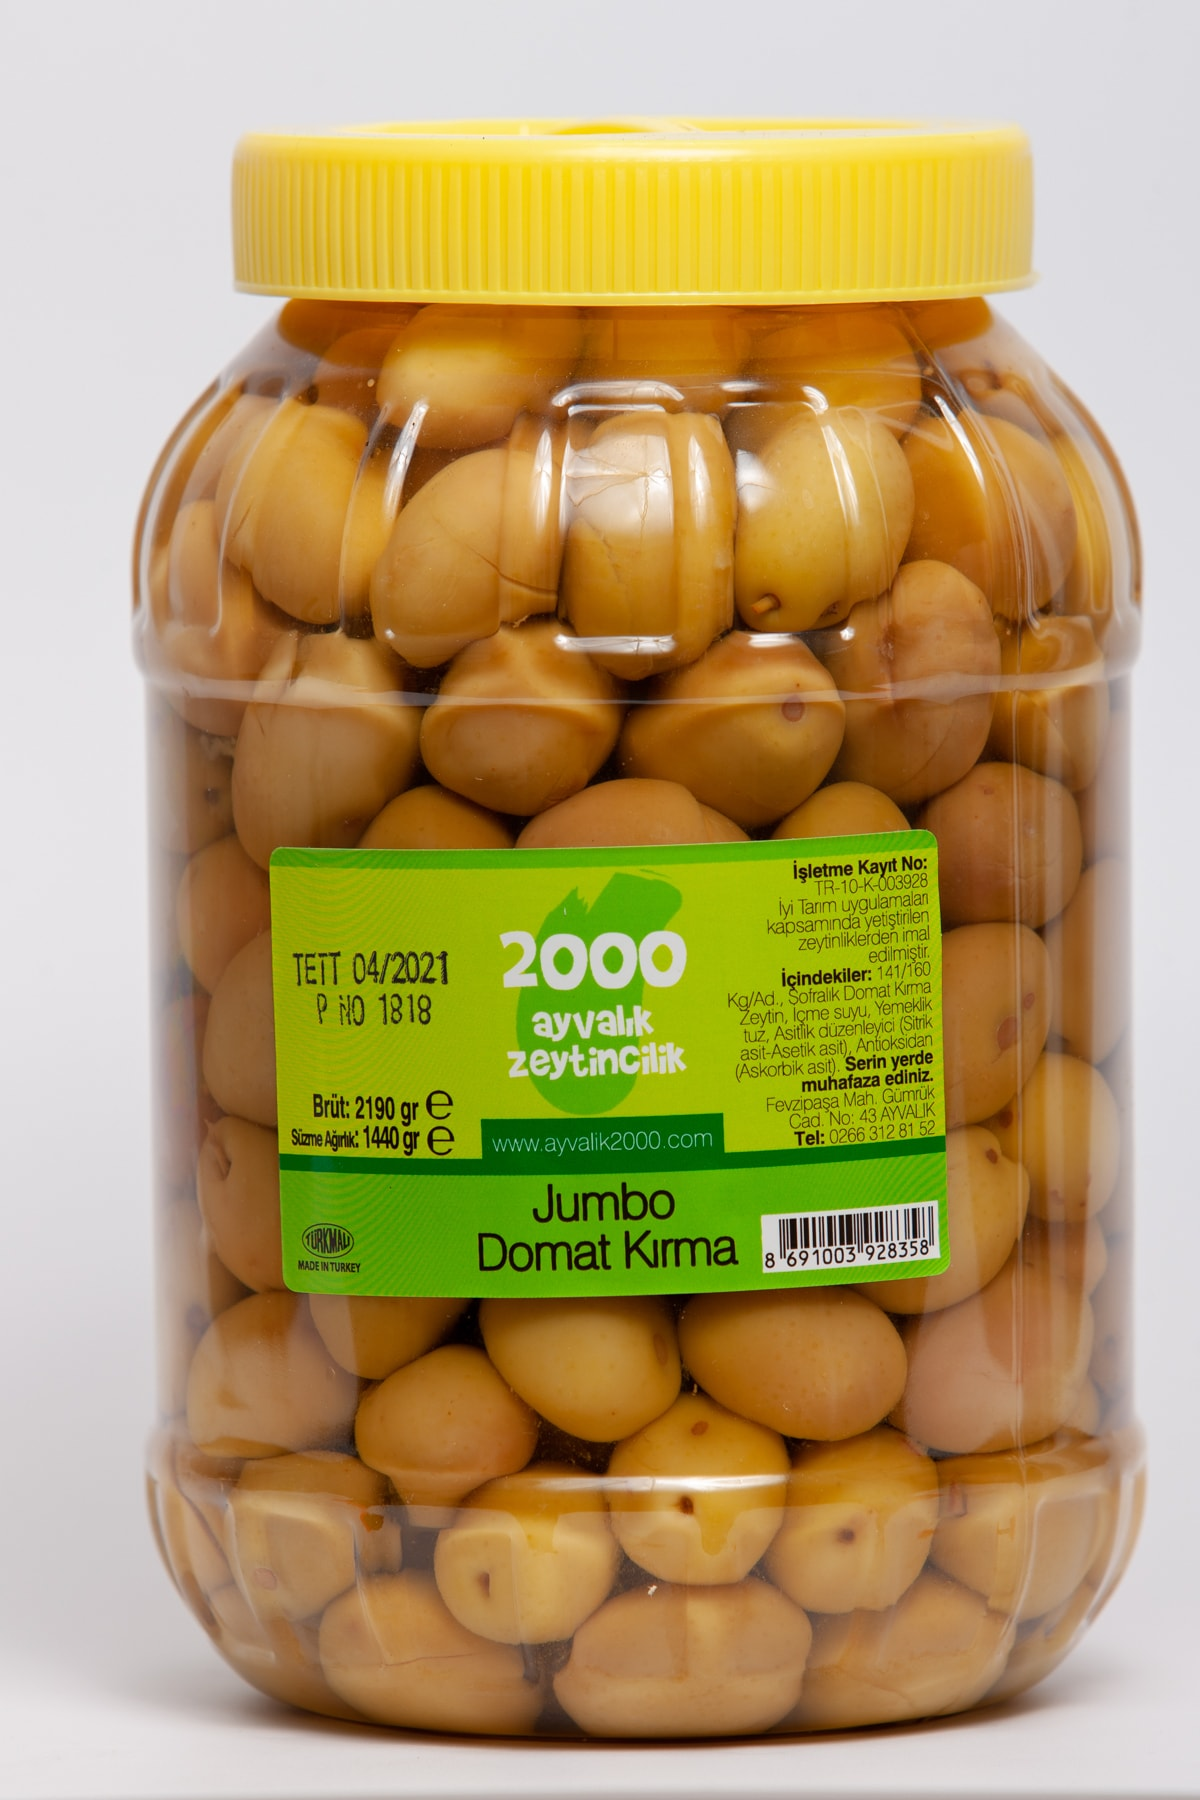 Jumbo Domat Kırma 1440 gr. (4xl-141-160 kg/ad)